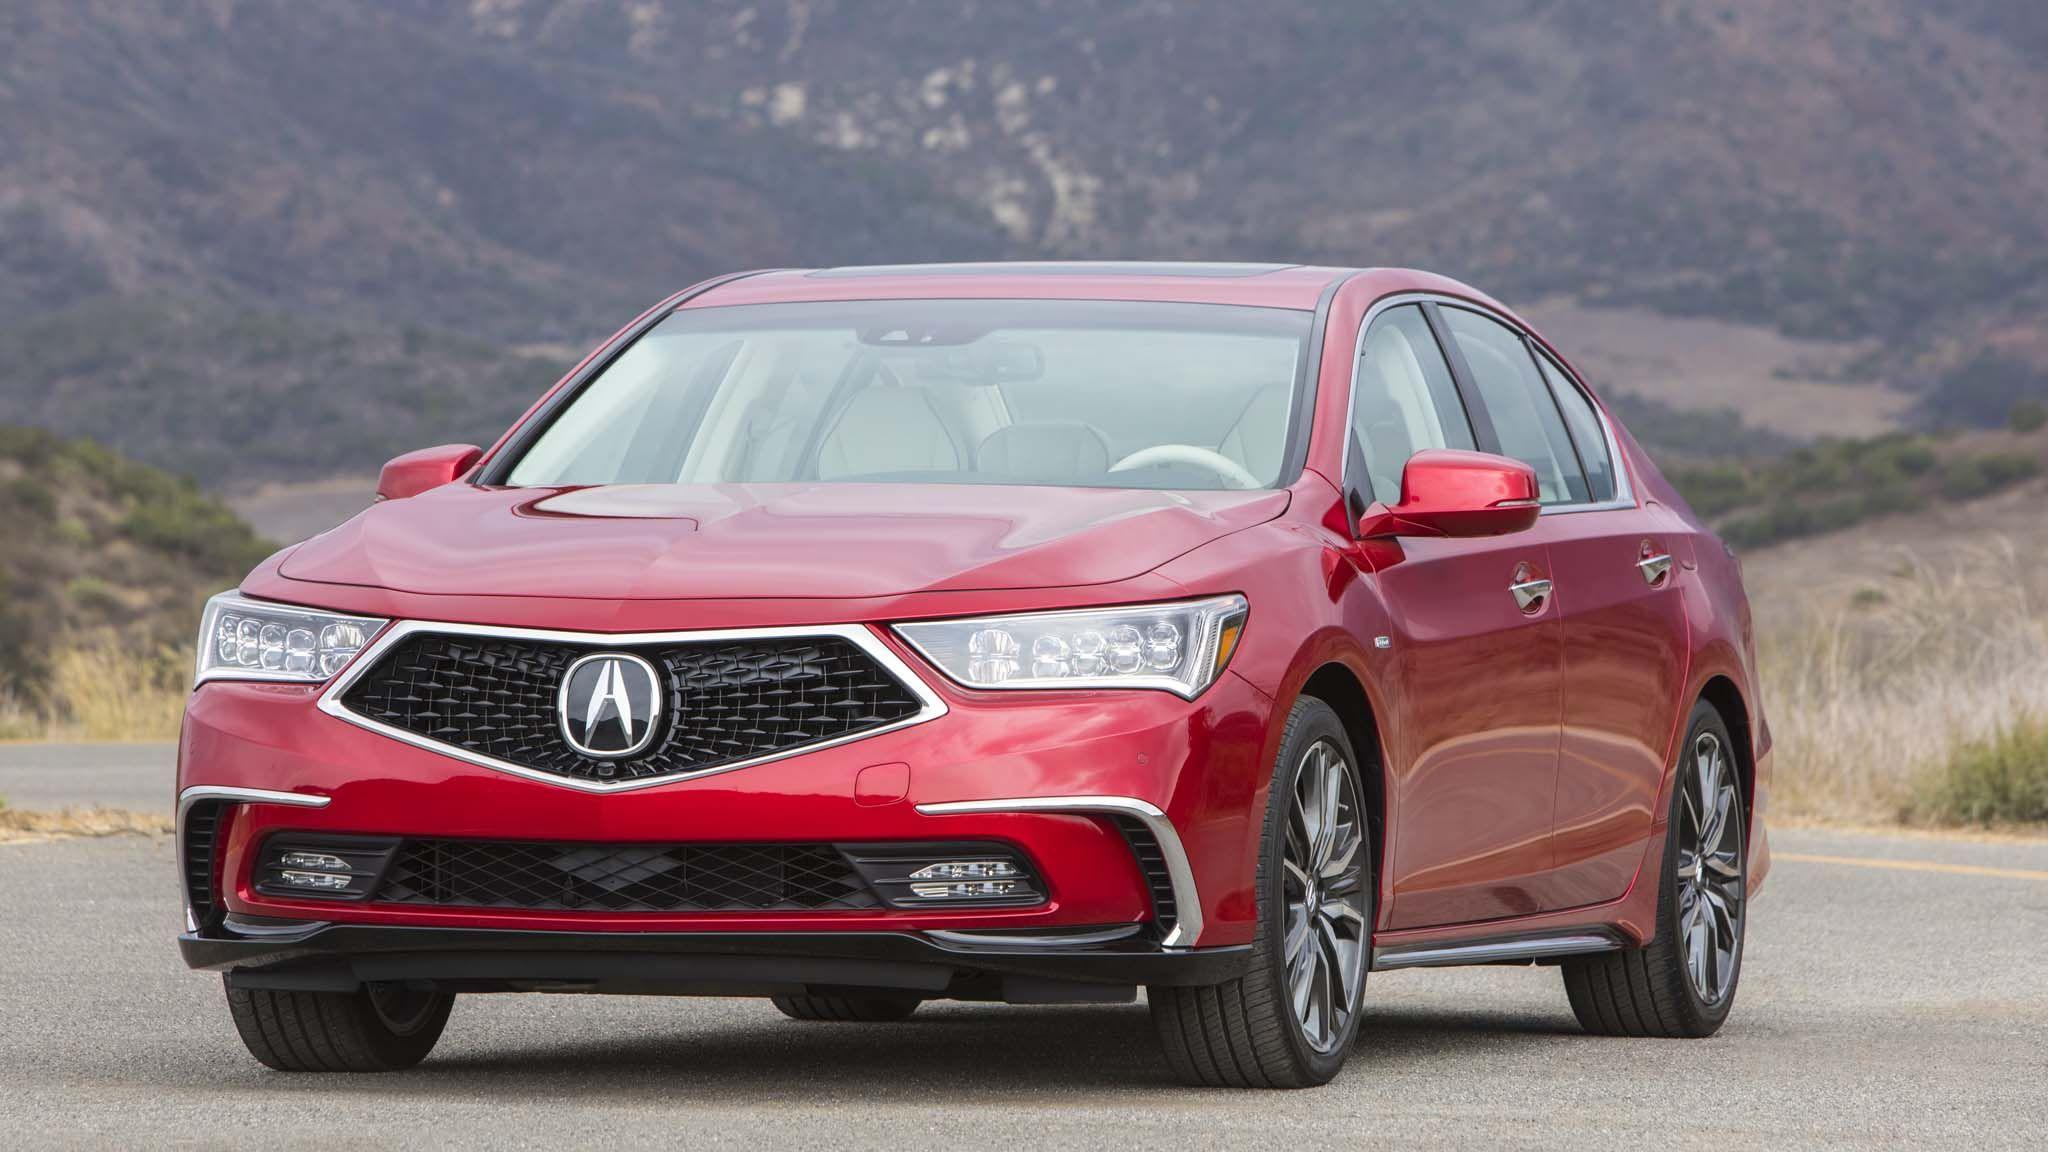 2020 Marks Acura Rlx Luxury Sedan S Last Year In The U S In 2020 Luxury Sedan Acura Sedan